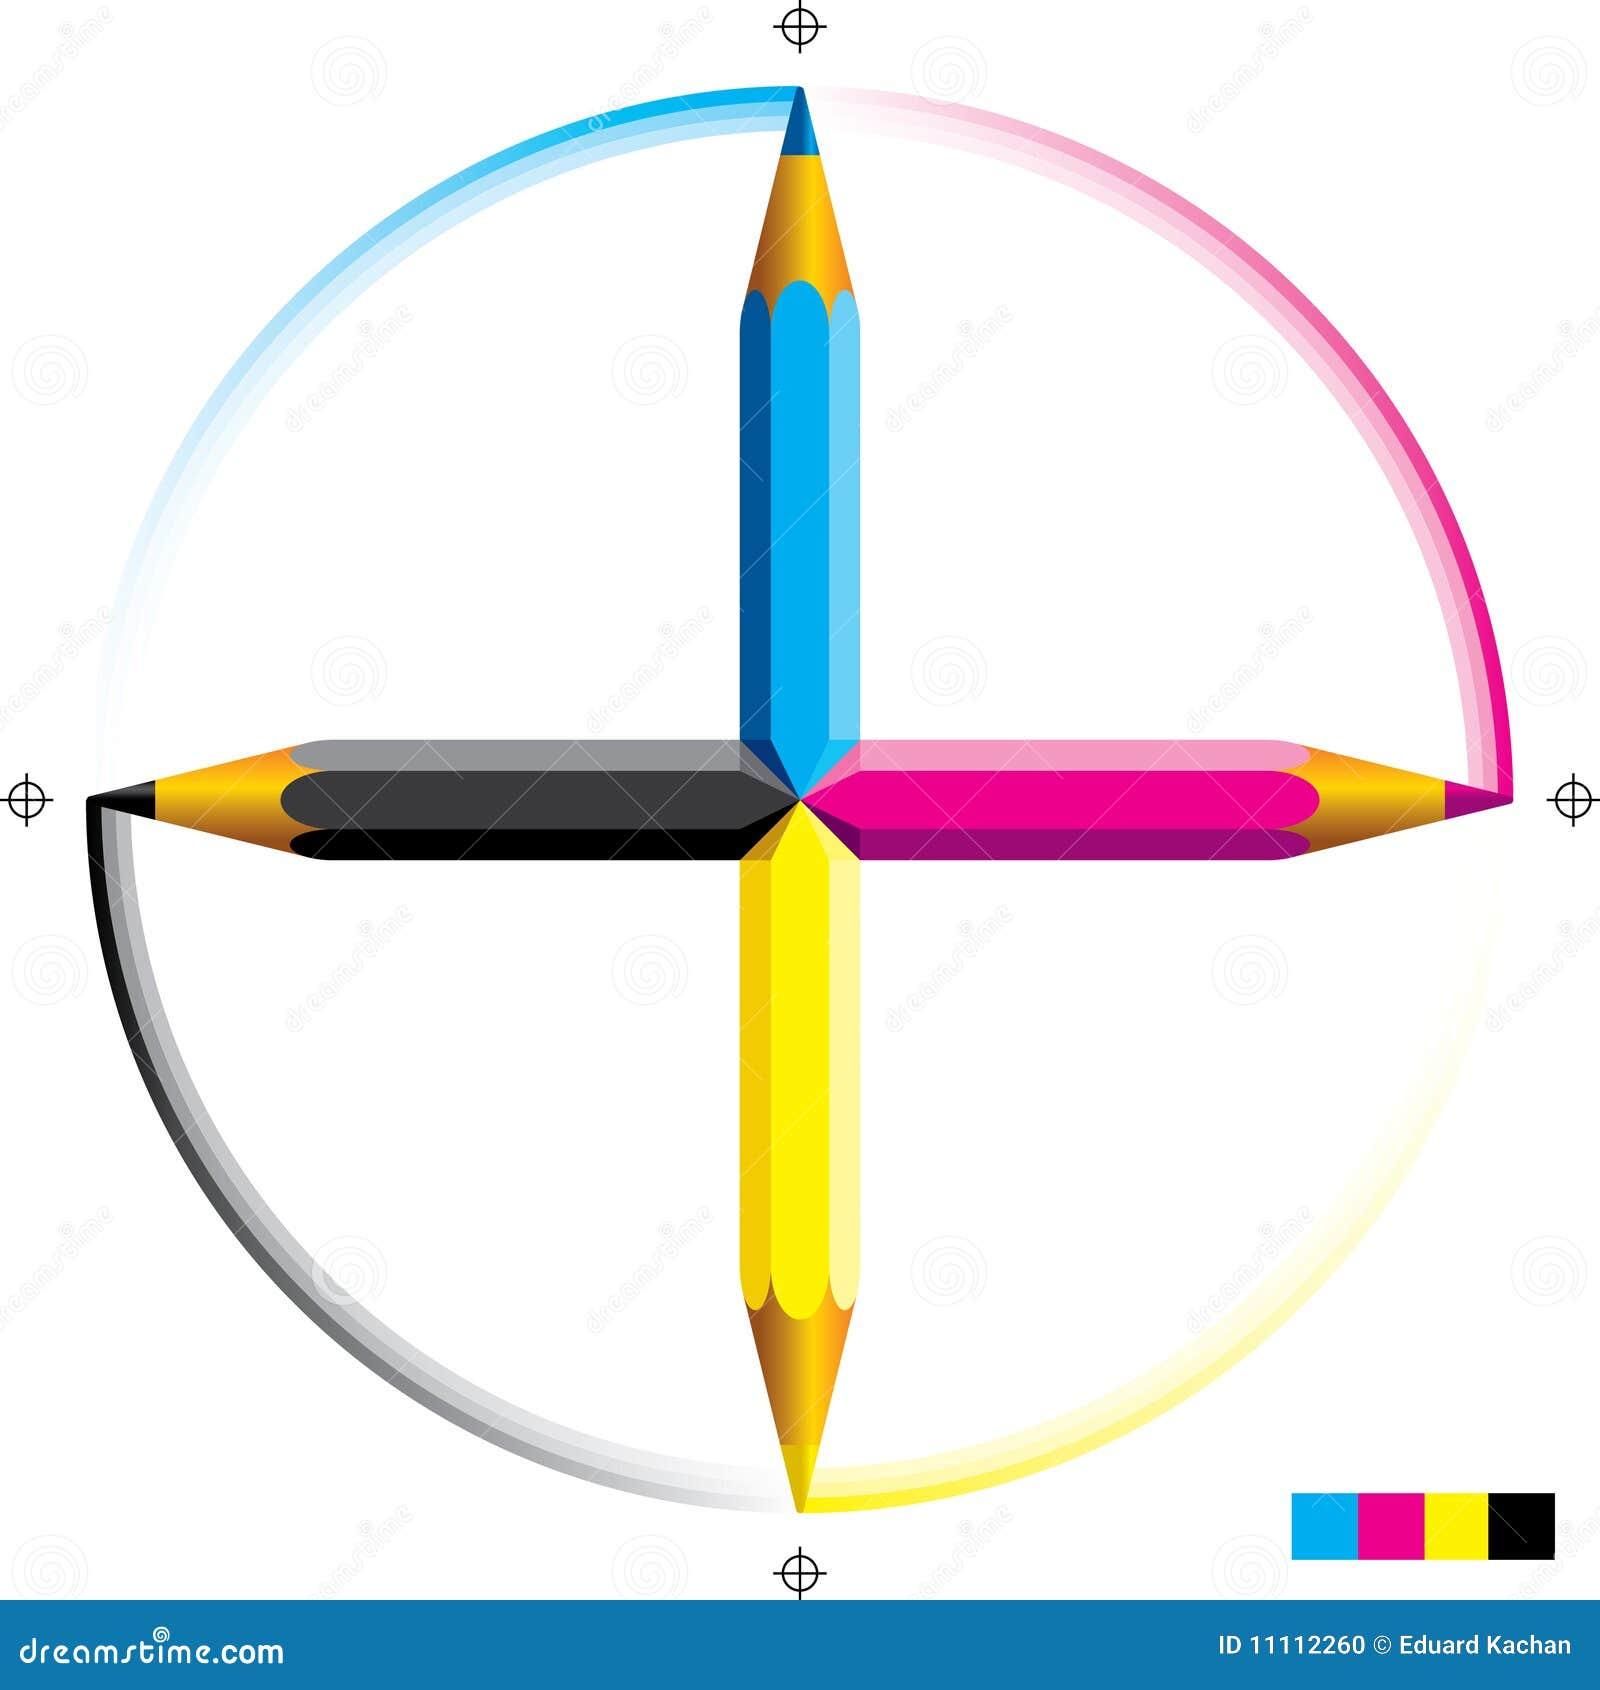 Cmyk pencils